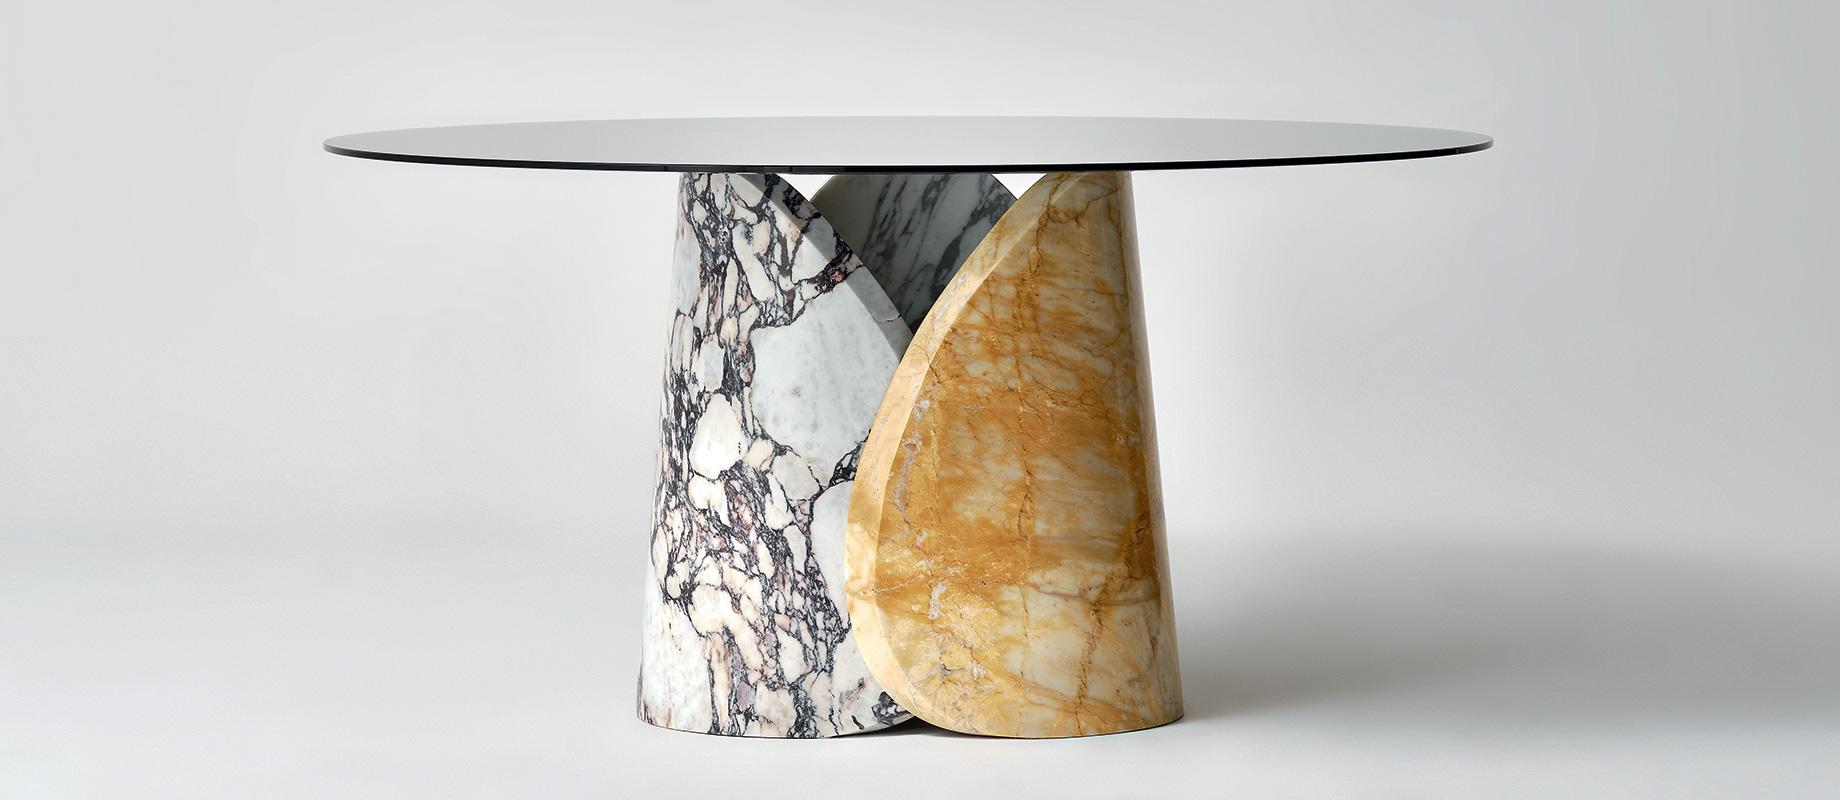 LithosDesign_petalo_giallo-siena_calacatta-viola_arabescato-vagli_designer_dining_tables_1_slider